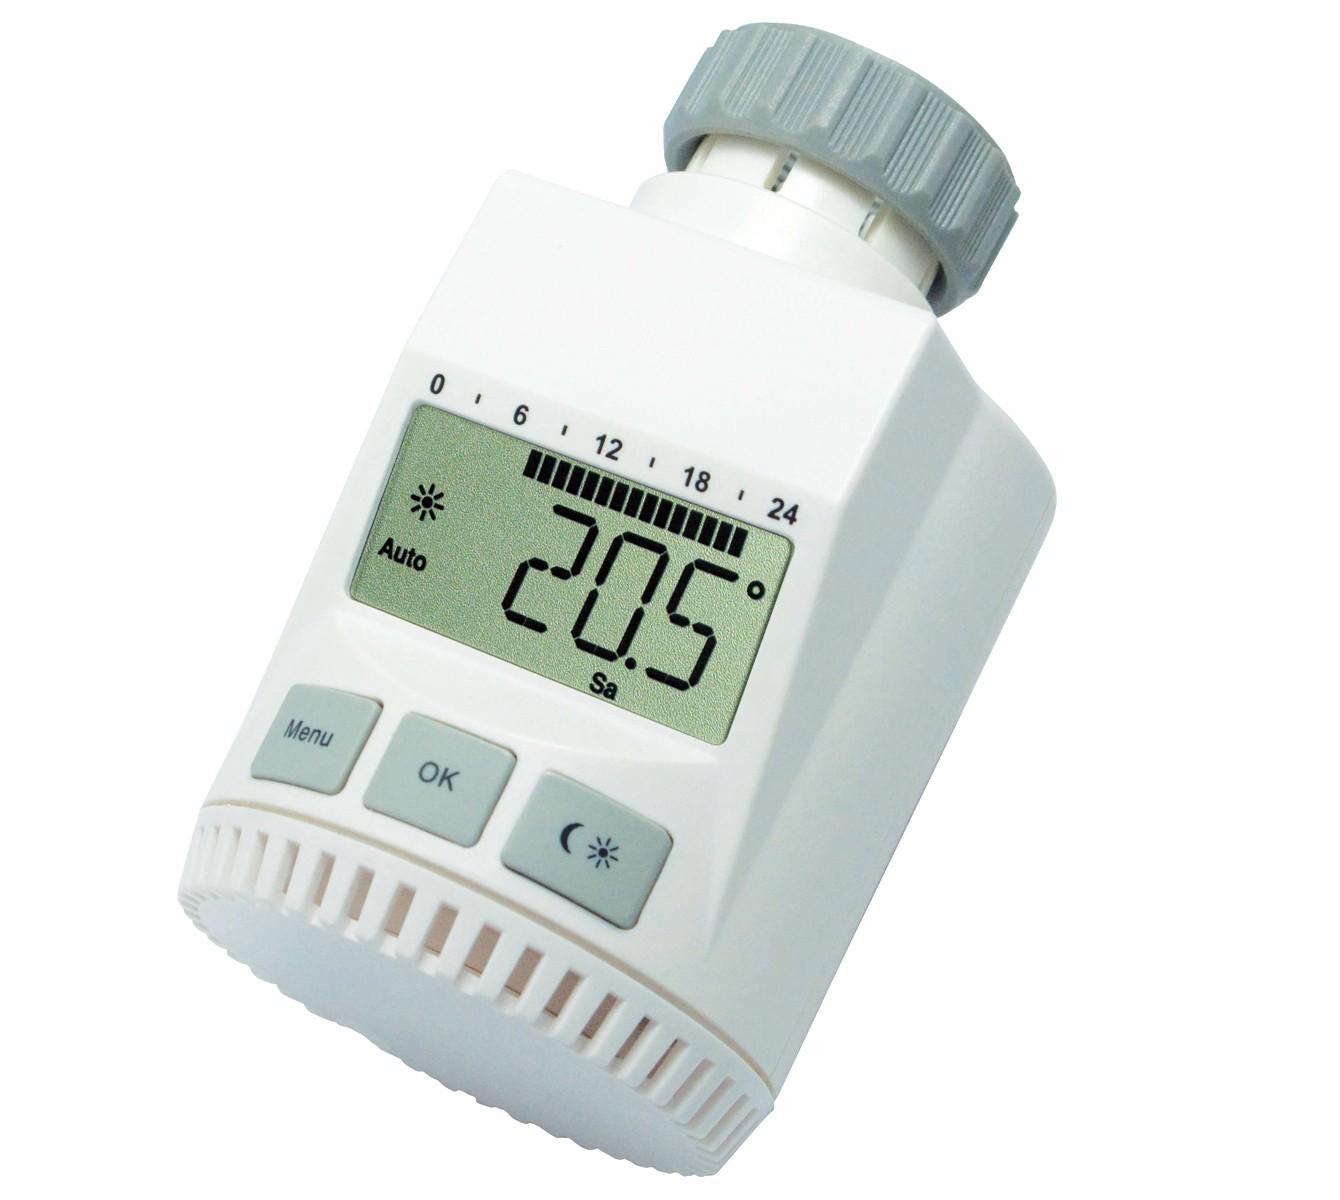 vavola-termostatica-elettronica